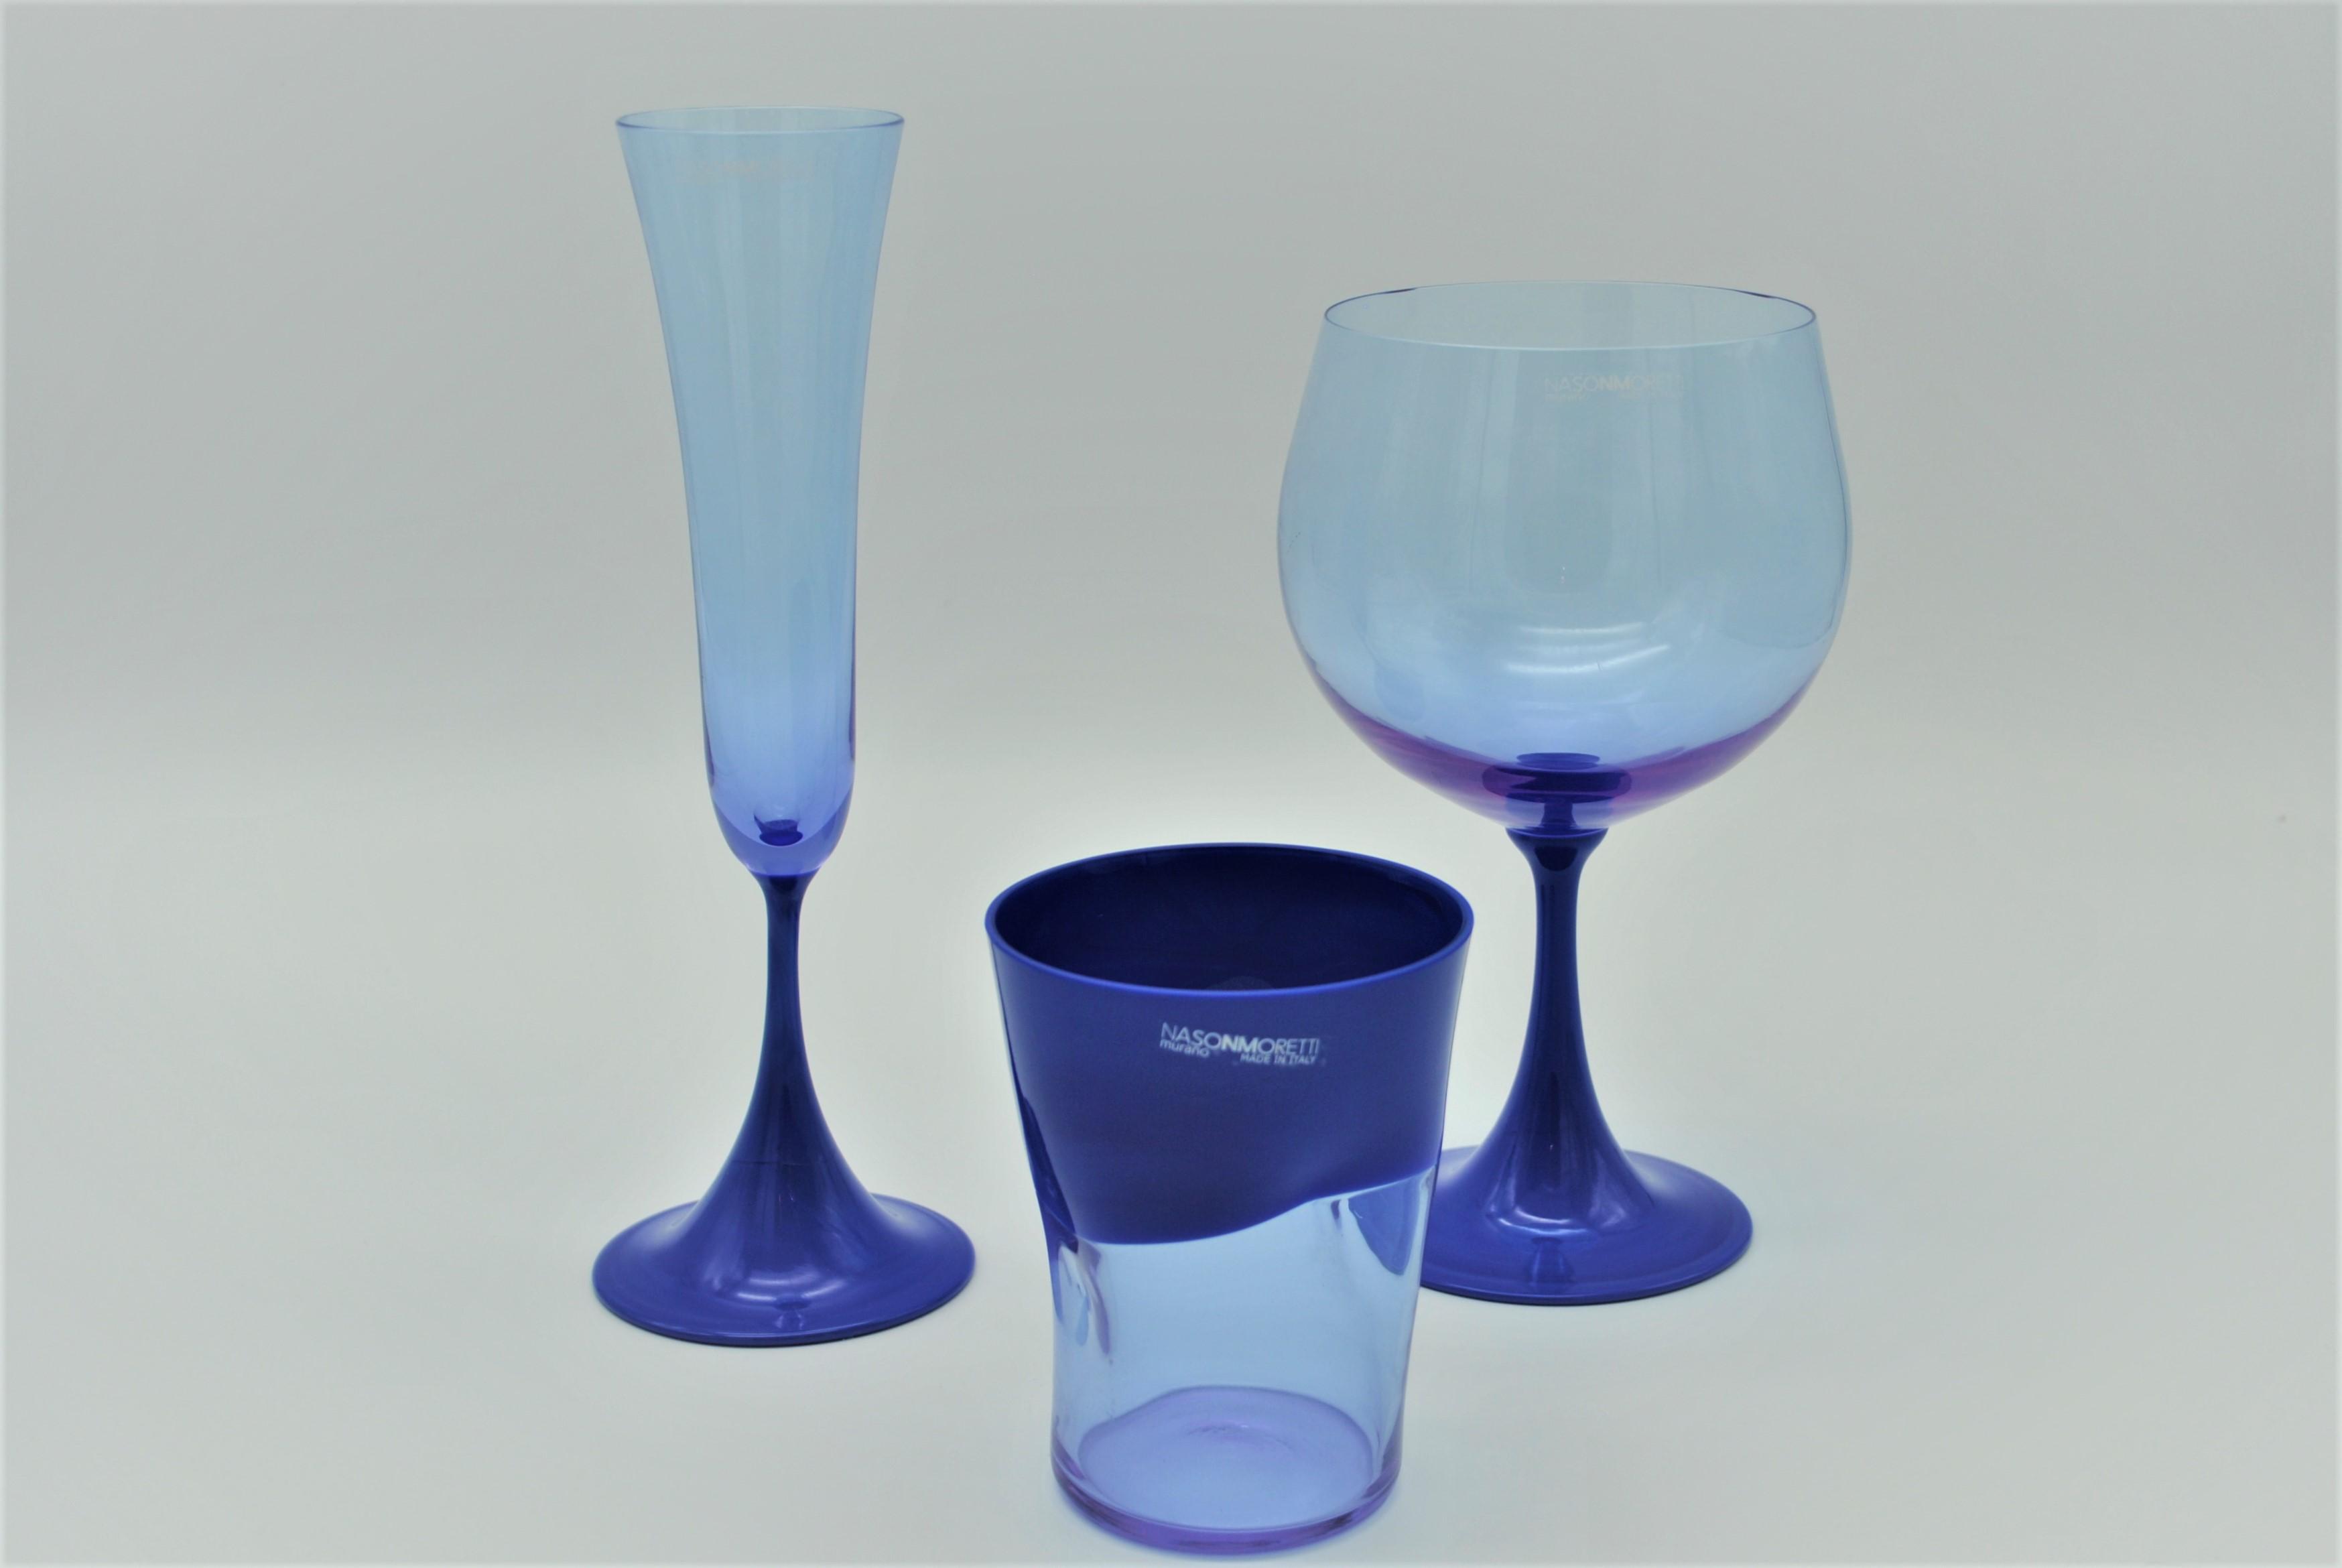 f3e59c0e4b34e NasonMoretti Burlesque Wine Glasses